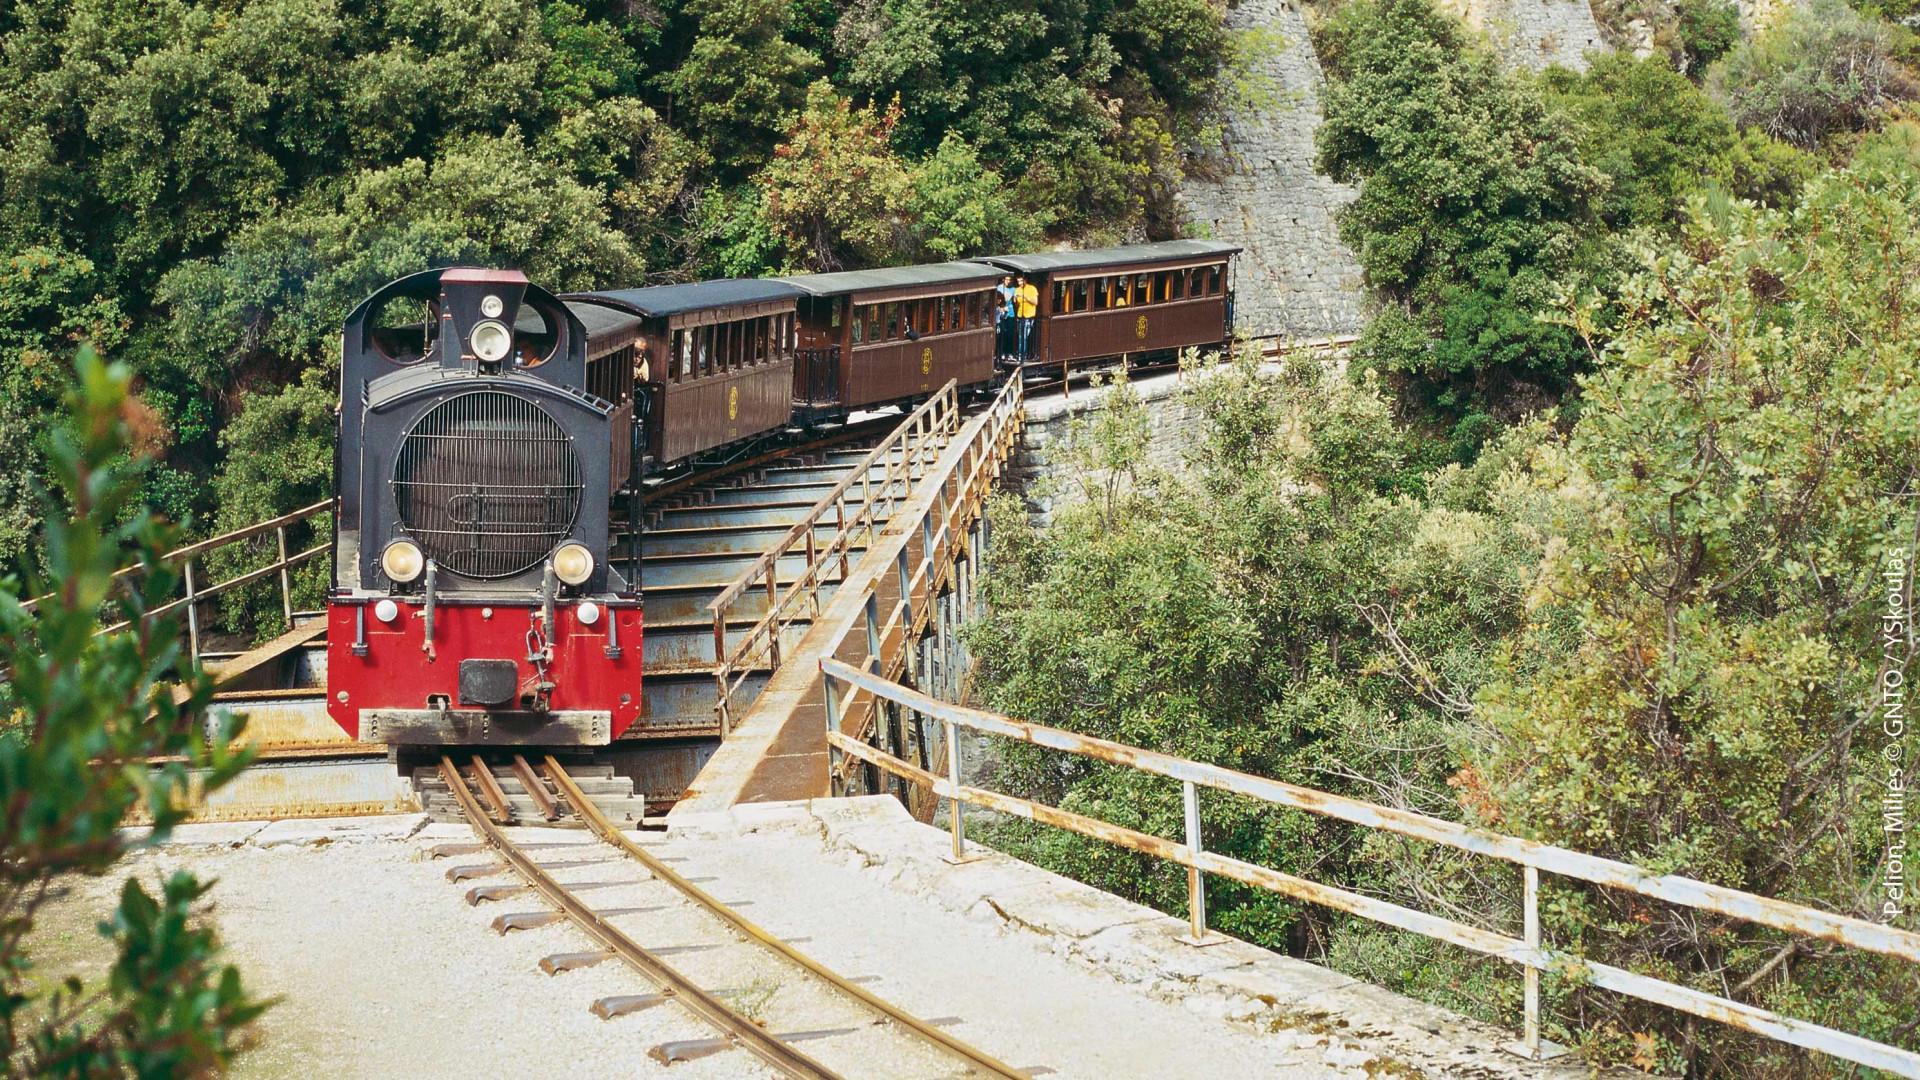 The Pelion steam train, Greece